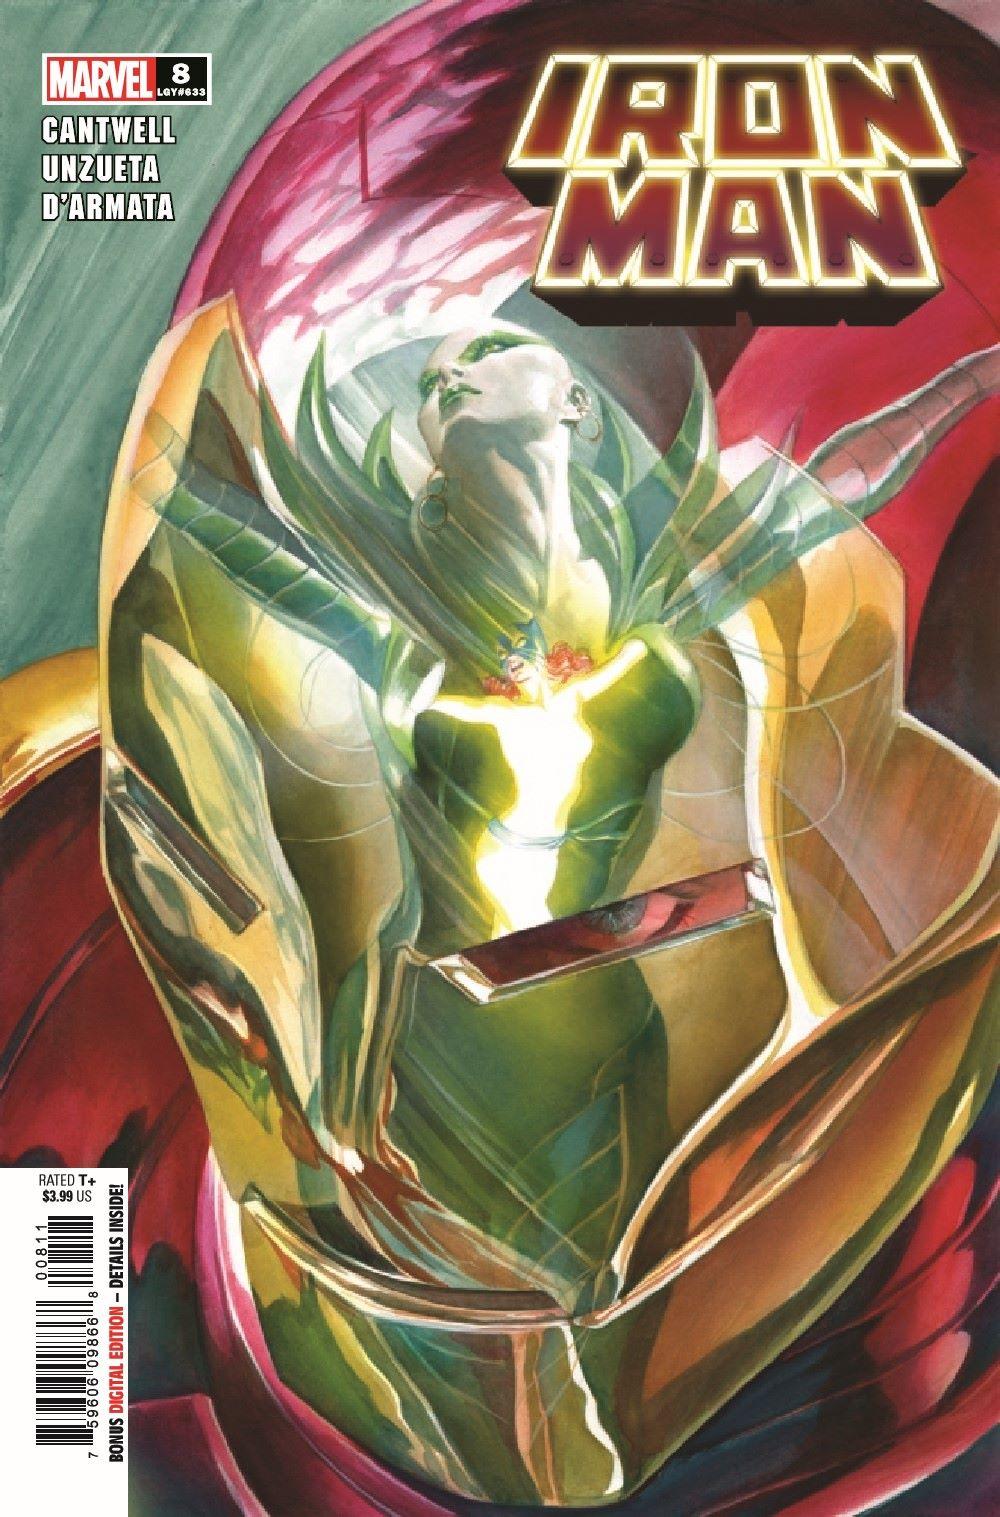 IM2020008_Preview-1 ComicList Previews: IRON MAN #8